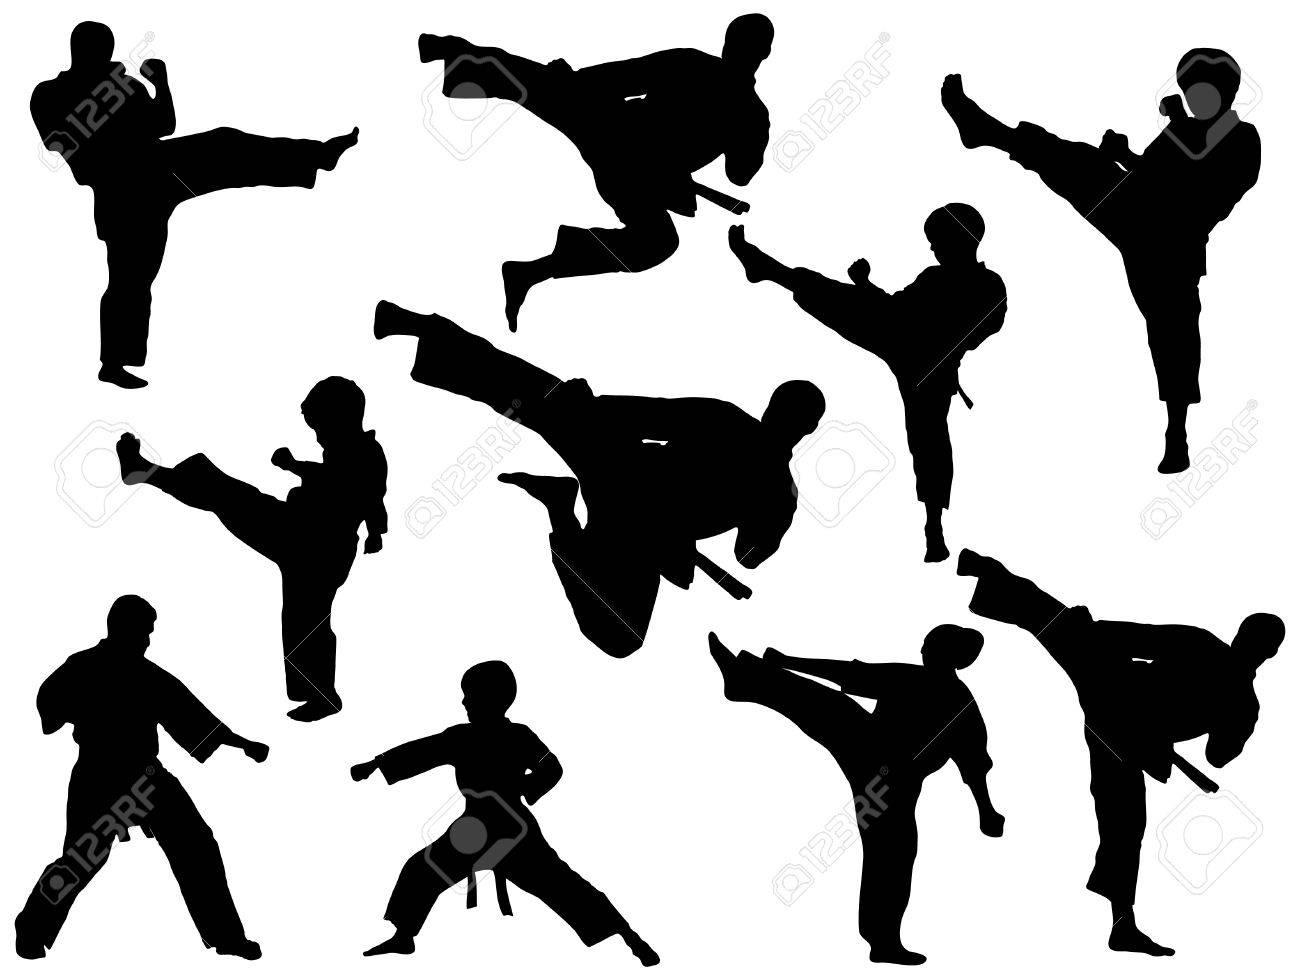 KARATE FIGHTERS - 5819713